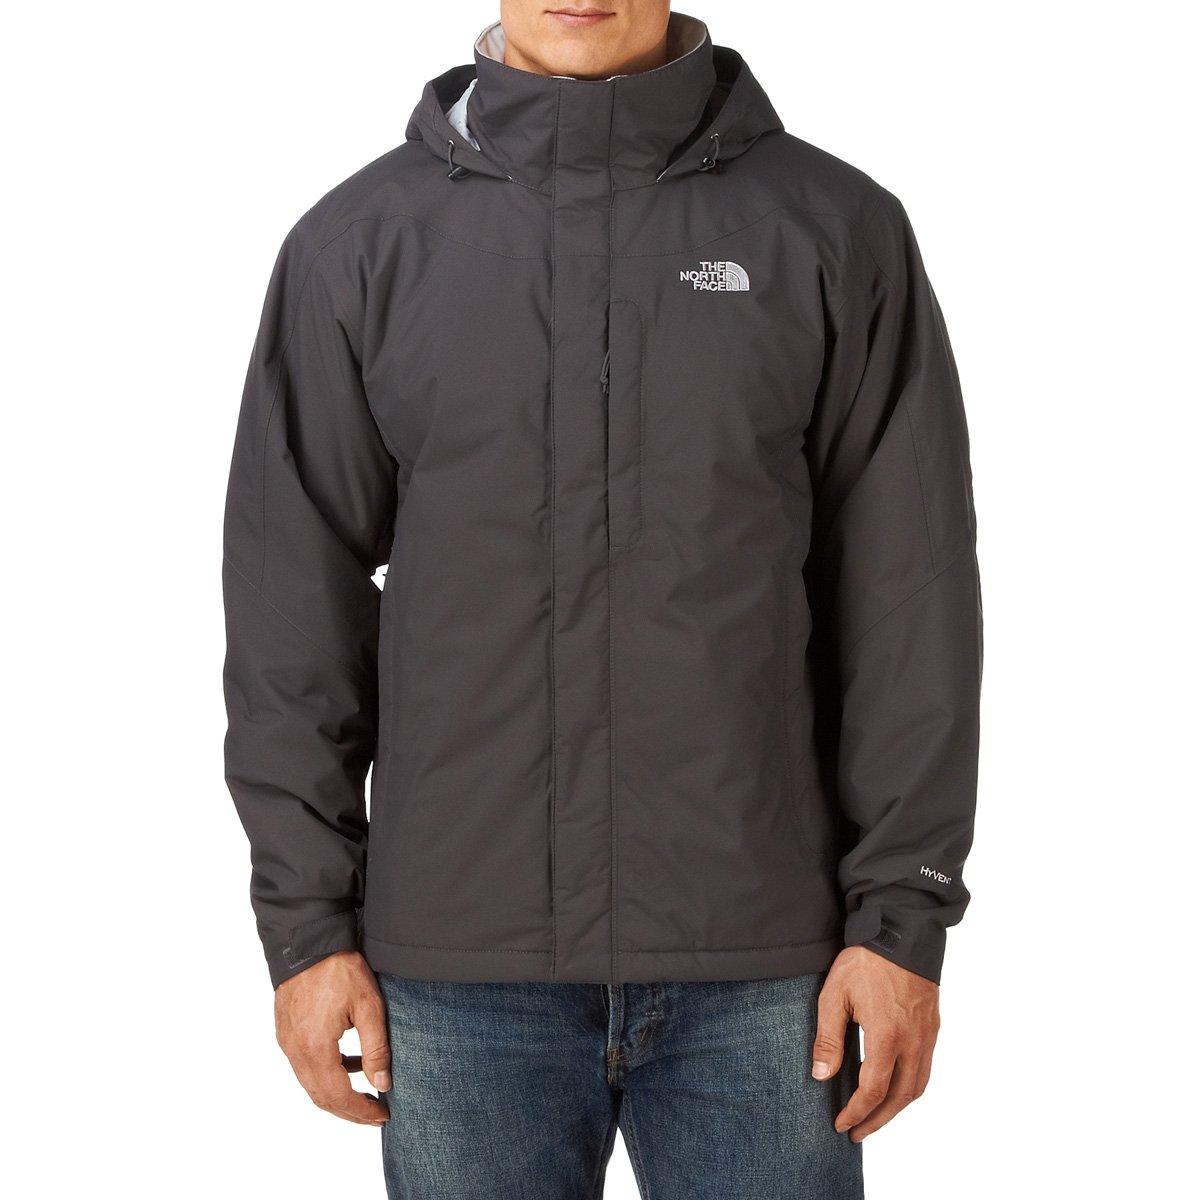 North Face Highland Jacket M, asphalt grey – grau, Gr. XXXL günstig online kaufen